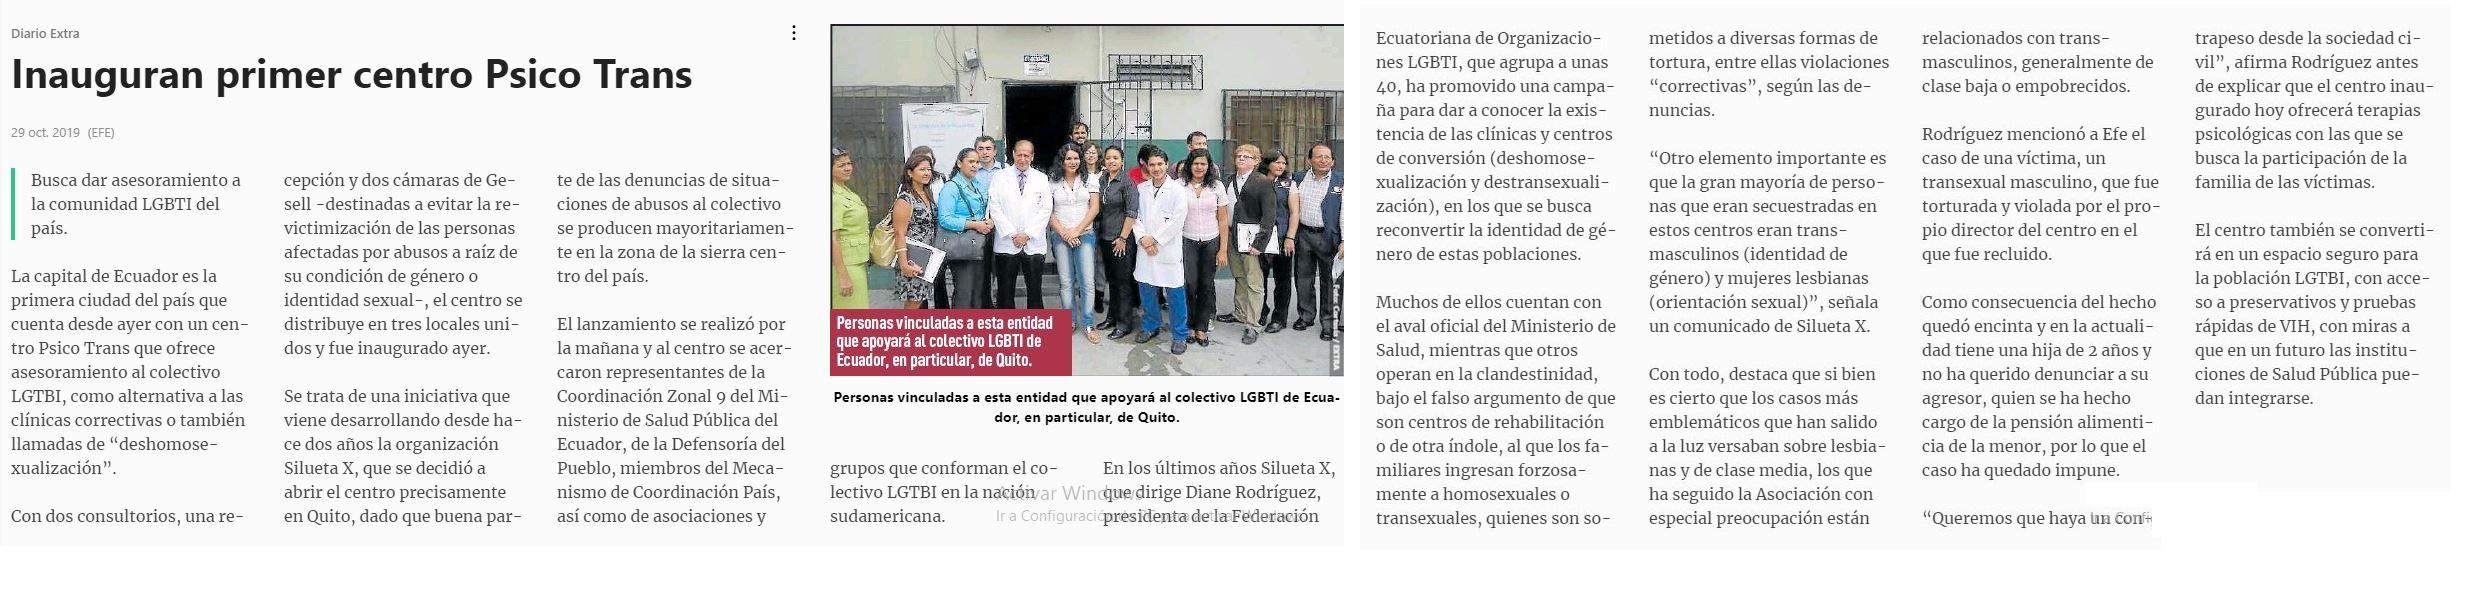 Reportaje de diario El Extra - Inauguran primer Centro psico Trans en Ecuador - Asociación Silueta X